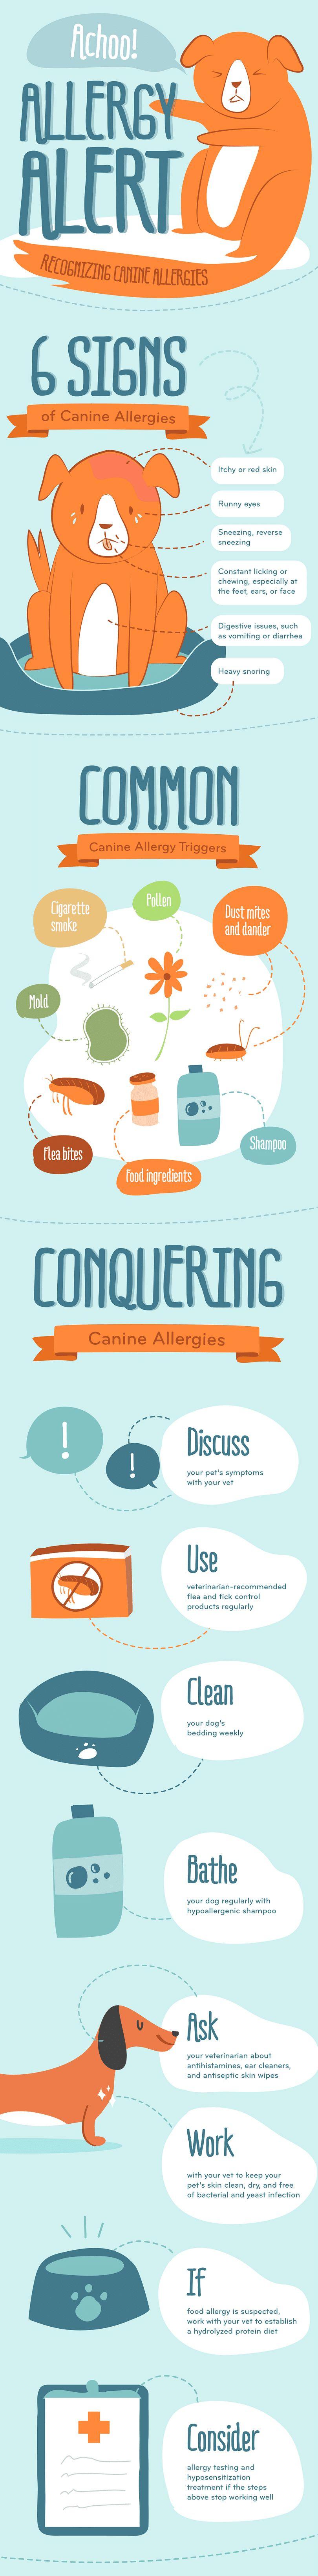 Las alergias del perro infografГa